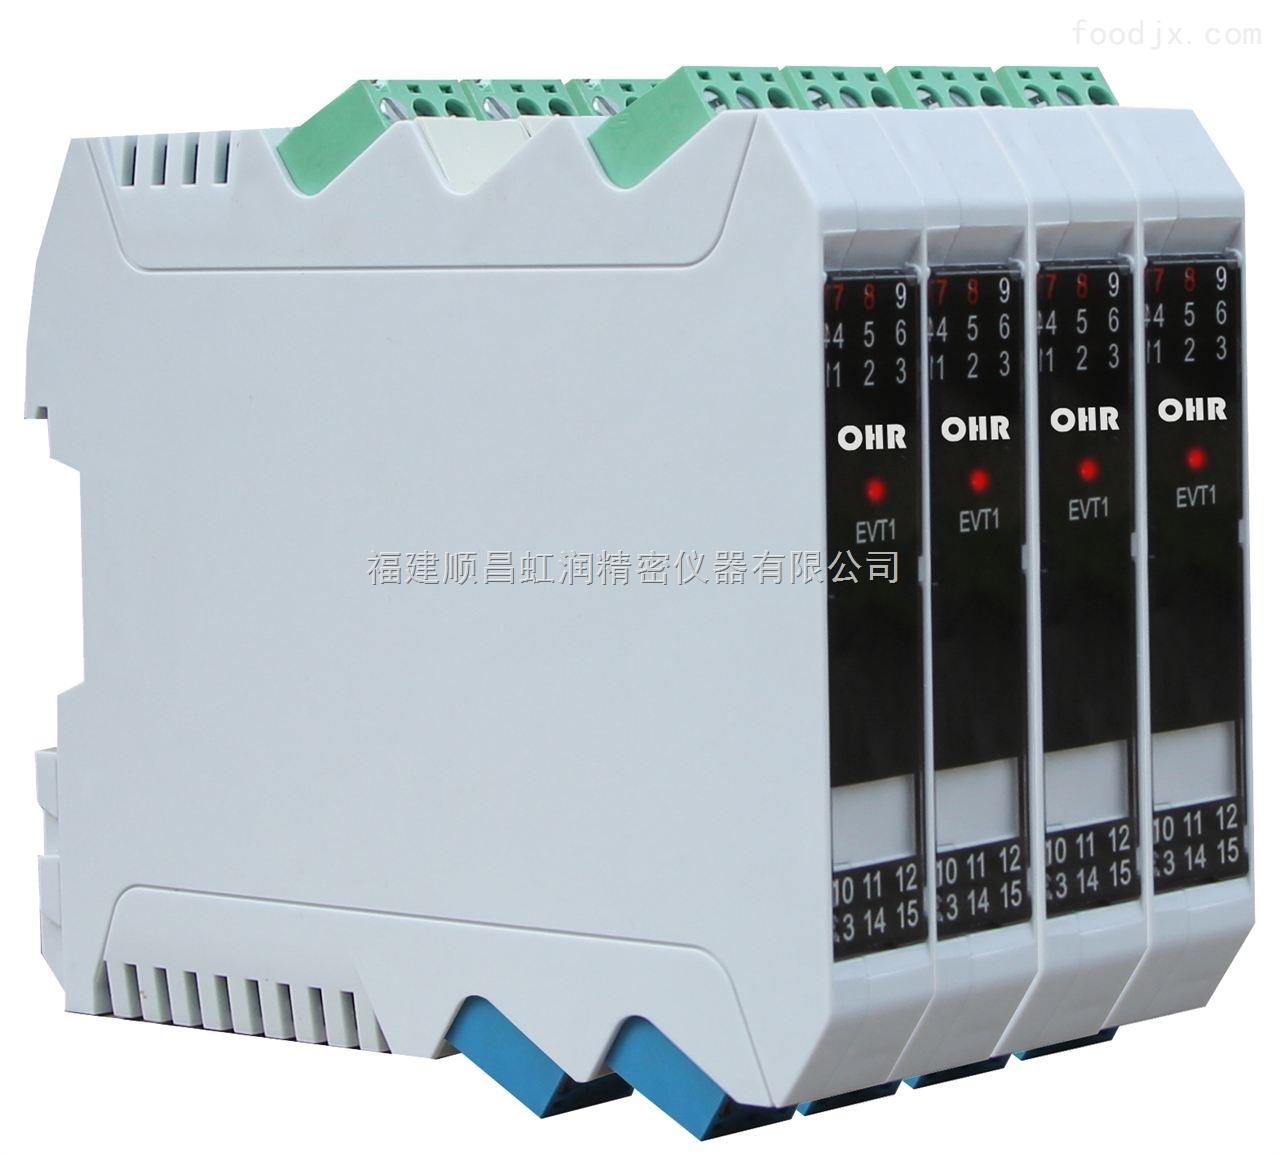 ohr-b31系列电压/电流输出操作端隔离栅将安全区来自dcs或plc等电气